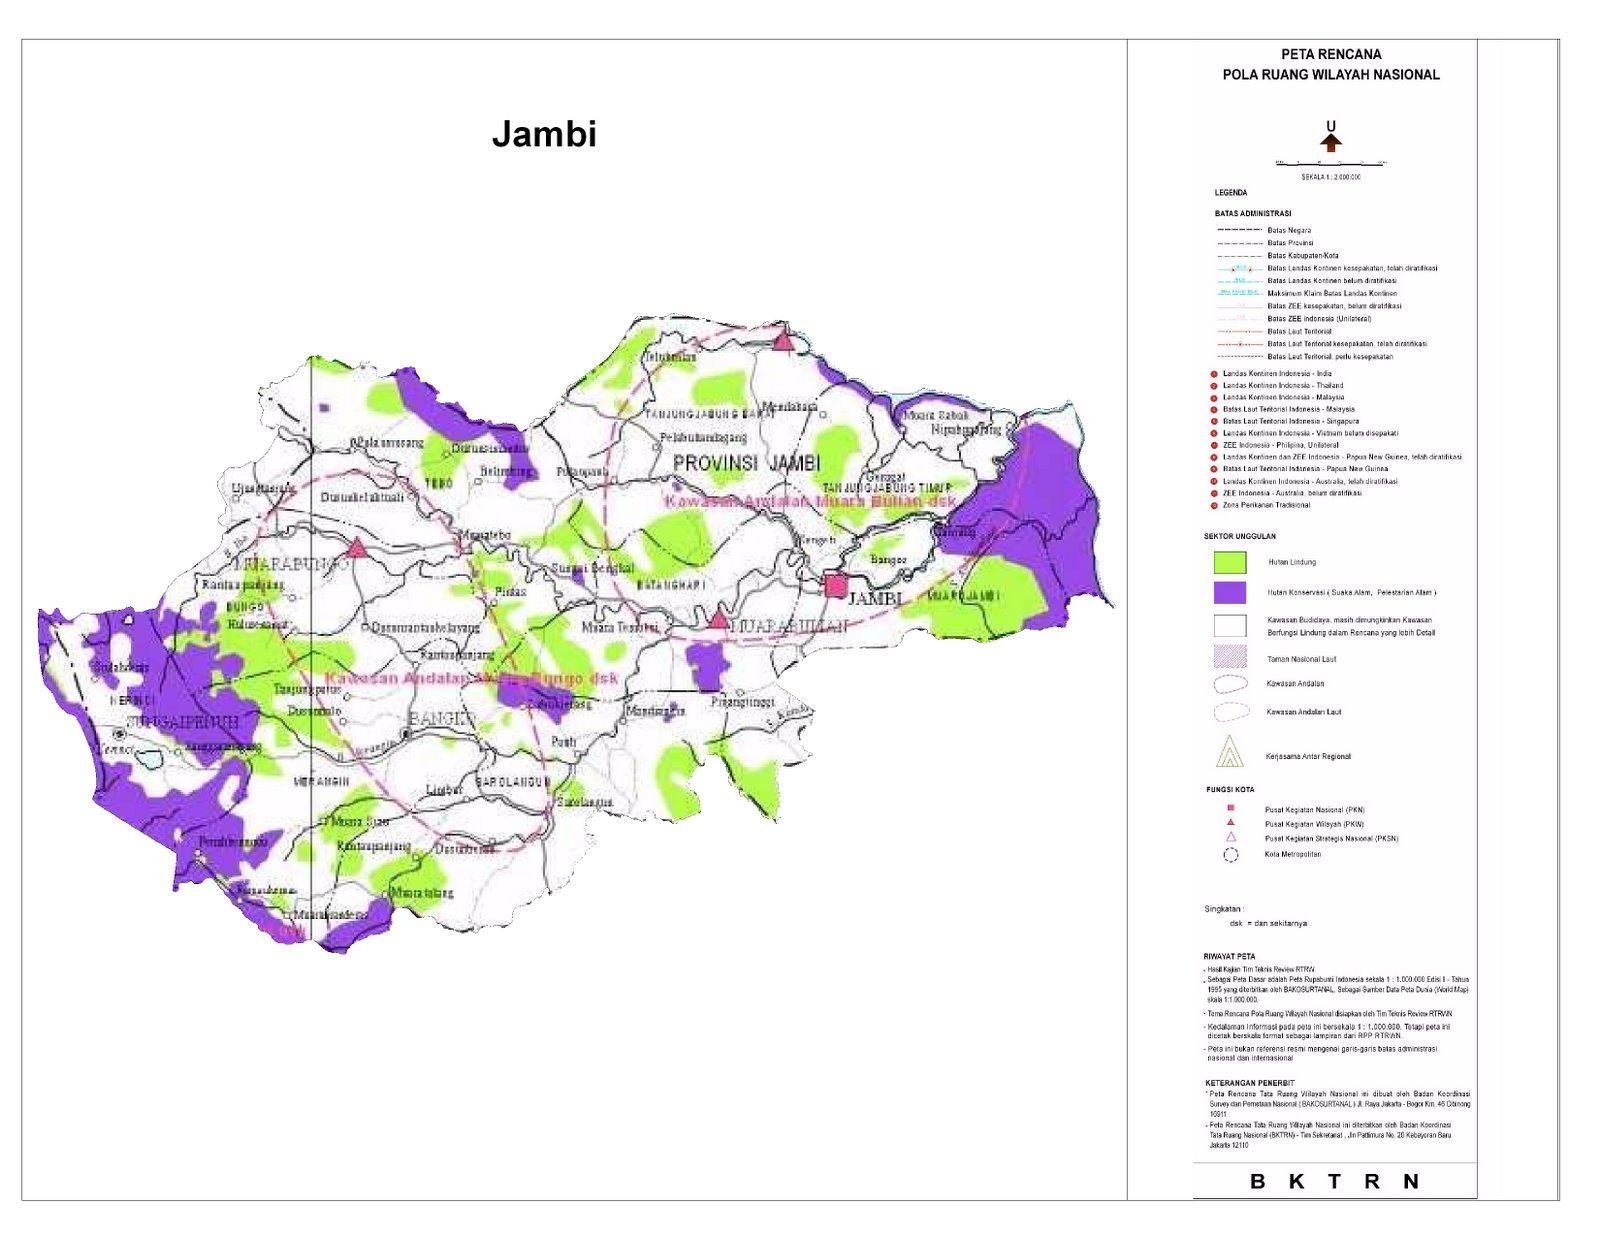 Proyeksi RTWN Terhadap Provinsi Jambi